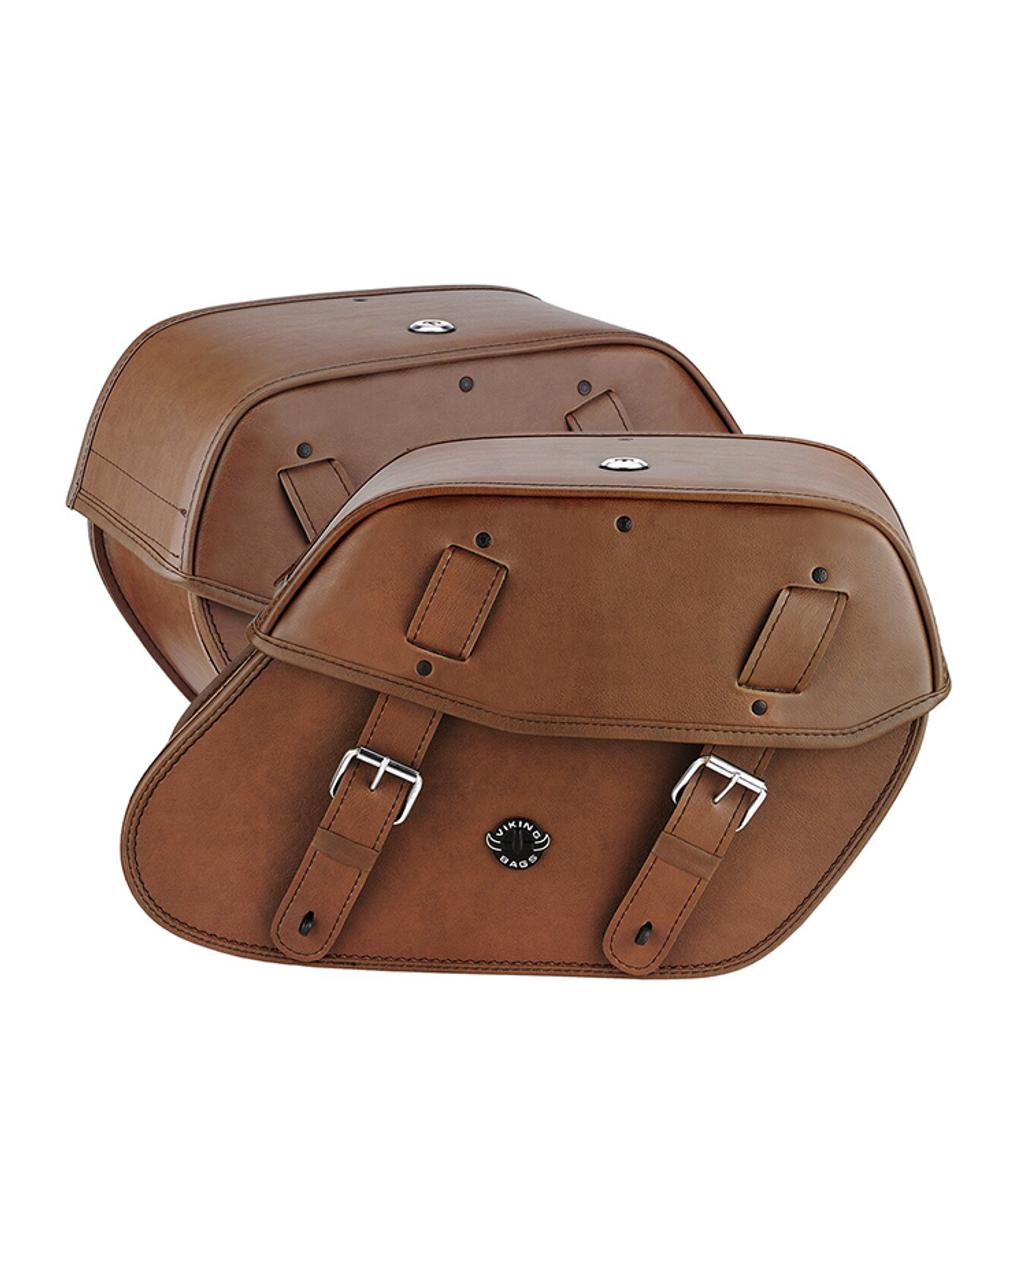 Viking Odin Brown Large Motorcycle Saddlebags For Harley Softail Custom FXSTC Both Bag